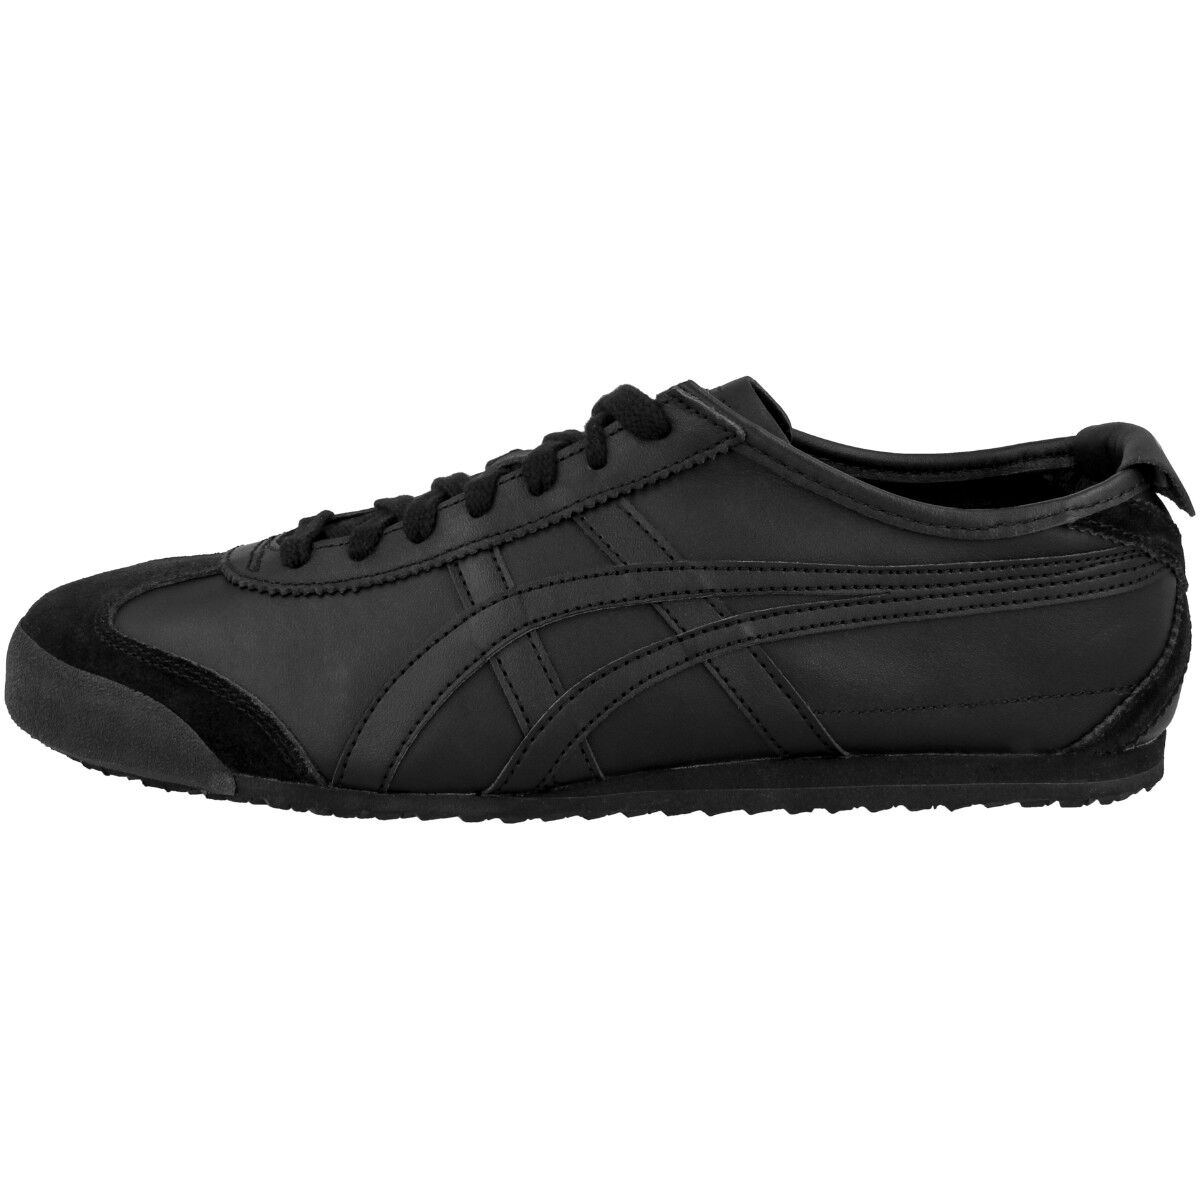 Asics Onitsuka Tiger Mexico 66 Schuhe black D4J2L-9090 Retro Sneaker Aaron Vulc